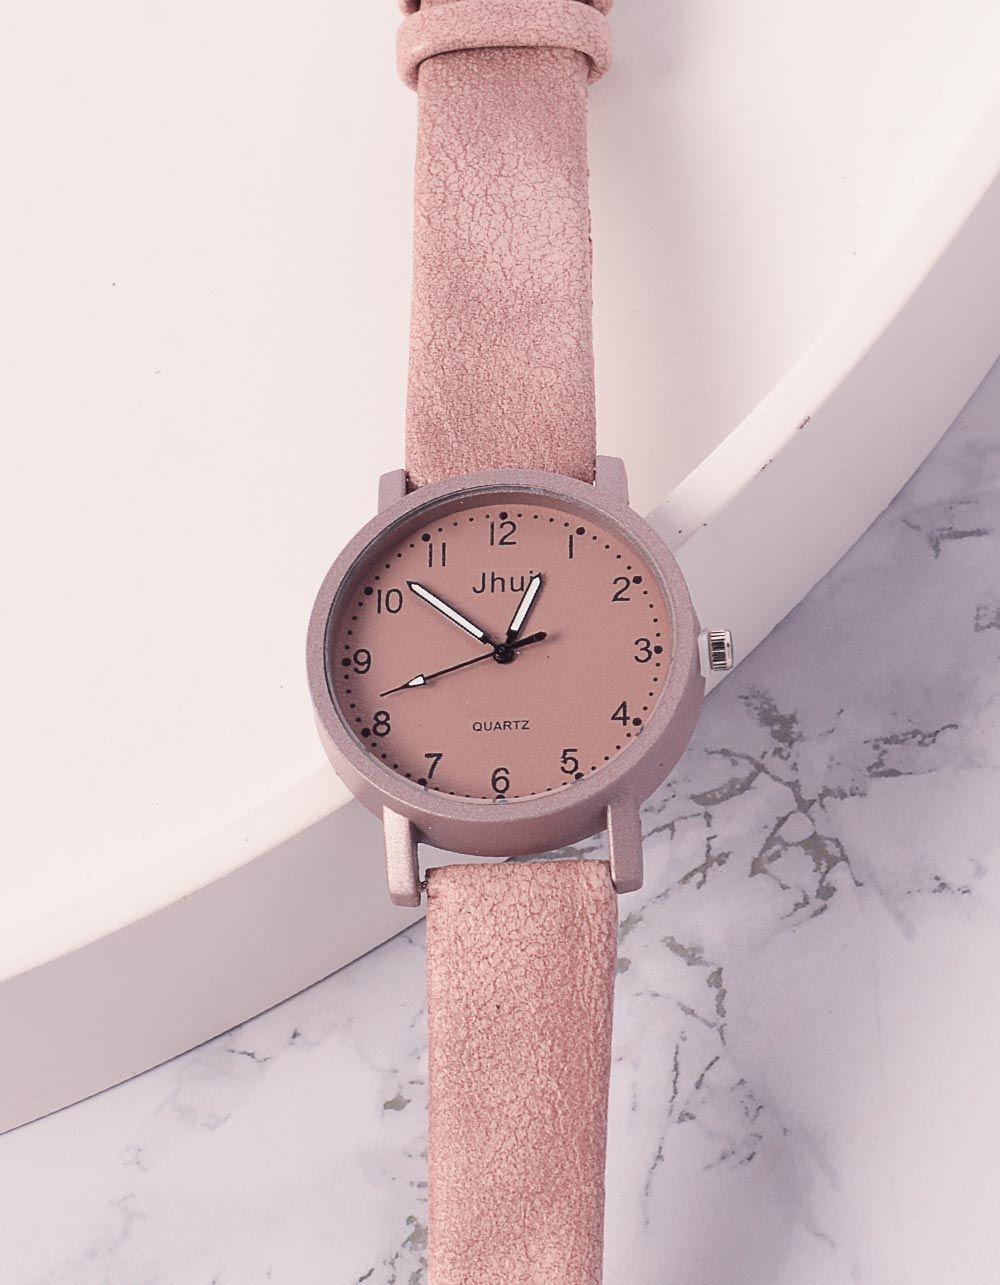 Годинник на руку з круглим циферблатом | 237305-71-XX